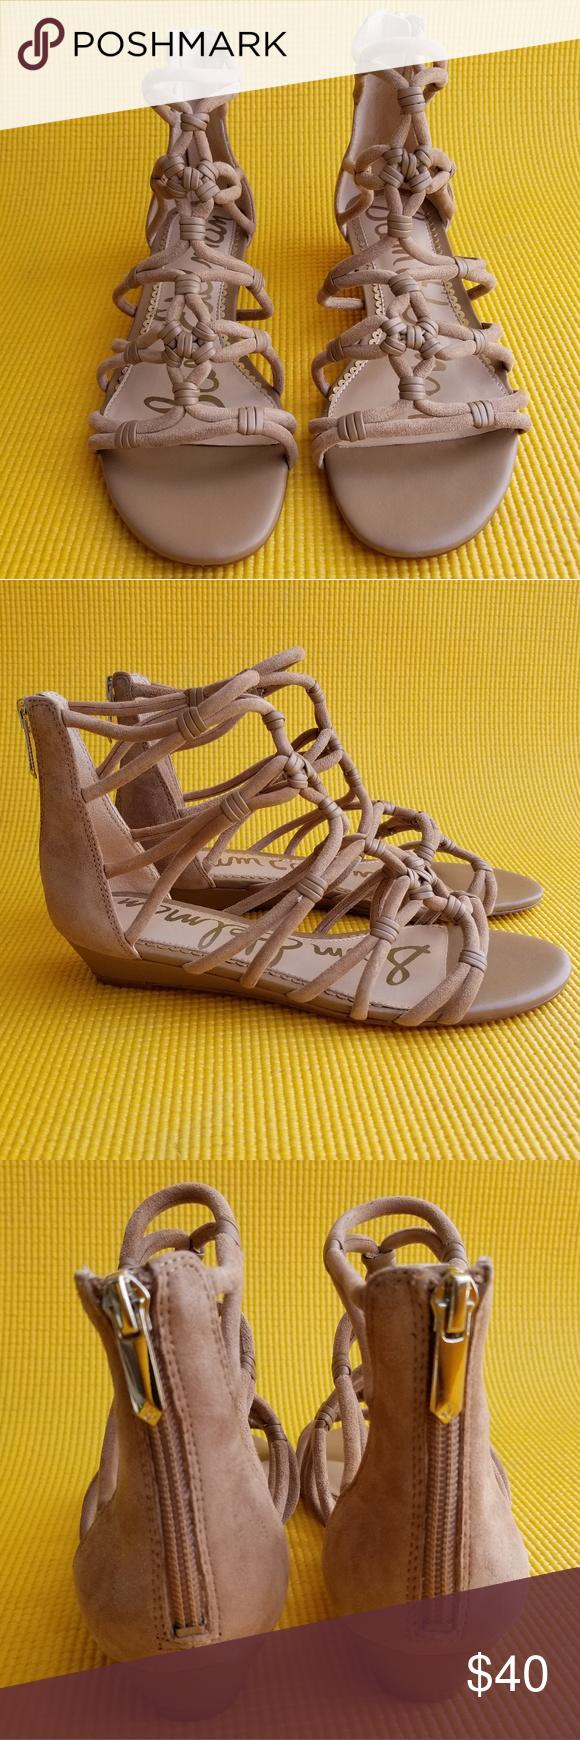 0e43b74c2 I just added this listing on Poshmark  Sam Edelman Daryn Gladiator Sandal.   shopmycloset  poshmark  fashion  shopping  style  forsale  Sam Edelman   Shoes